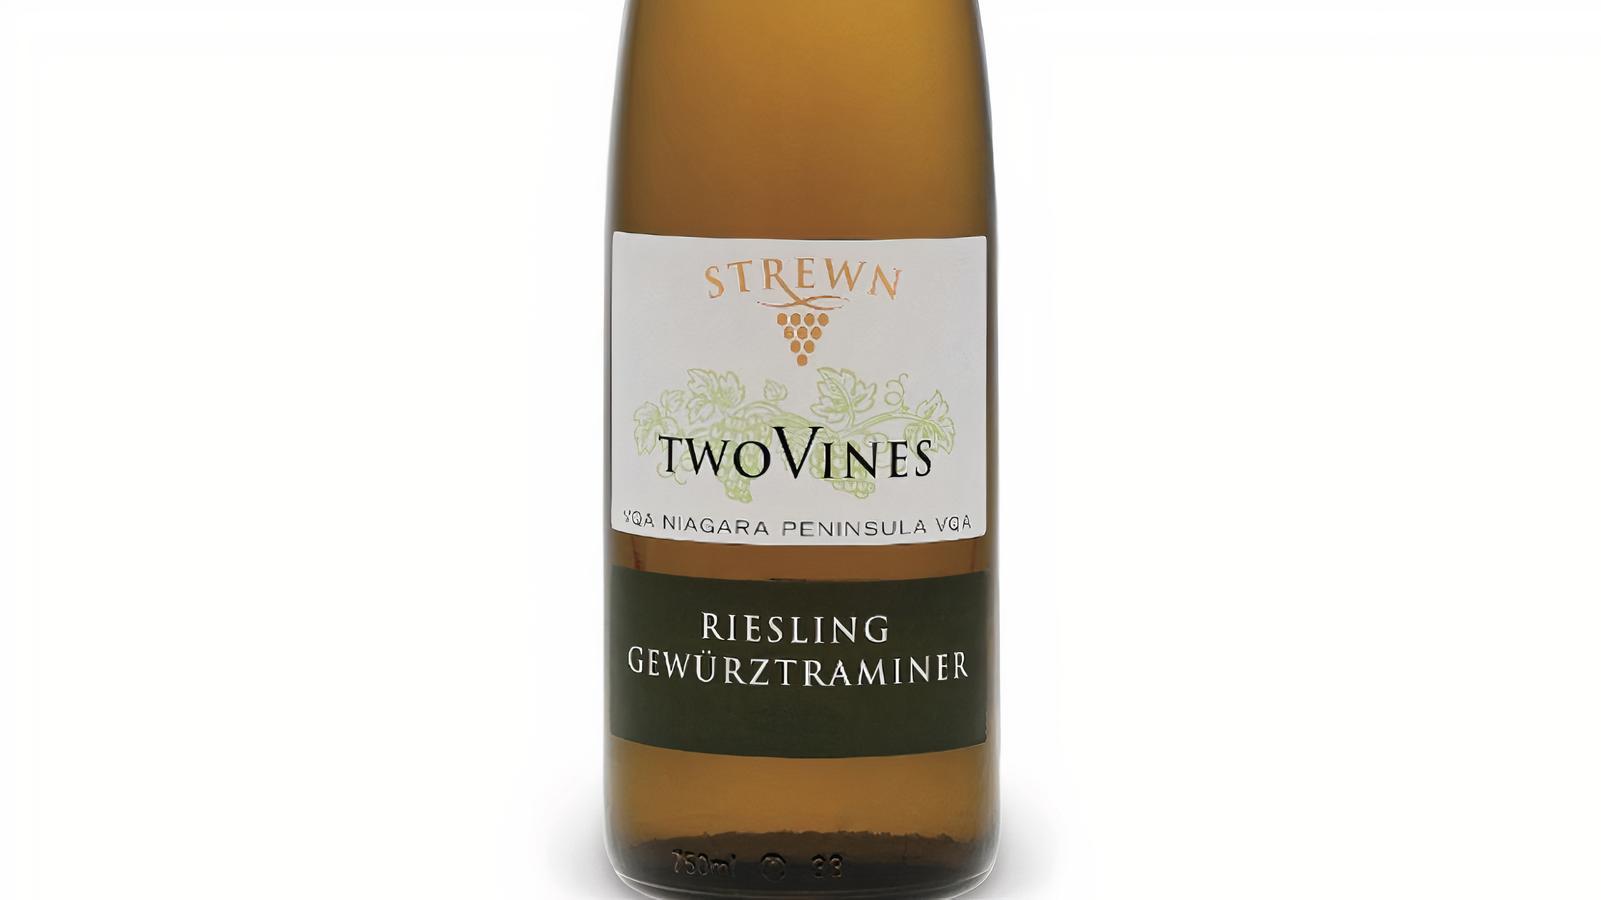 Strewn Riesling, 750mL white wine (11.8% ABV)